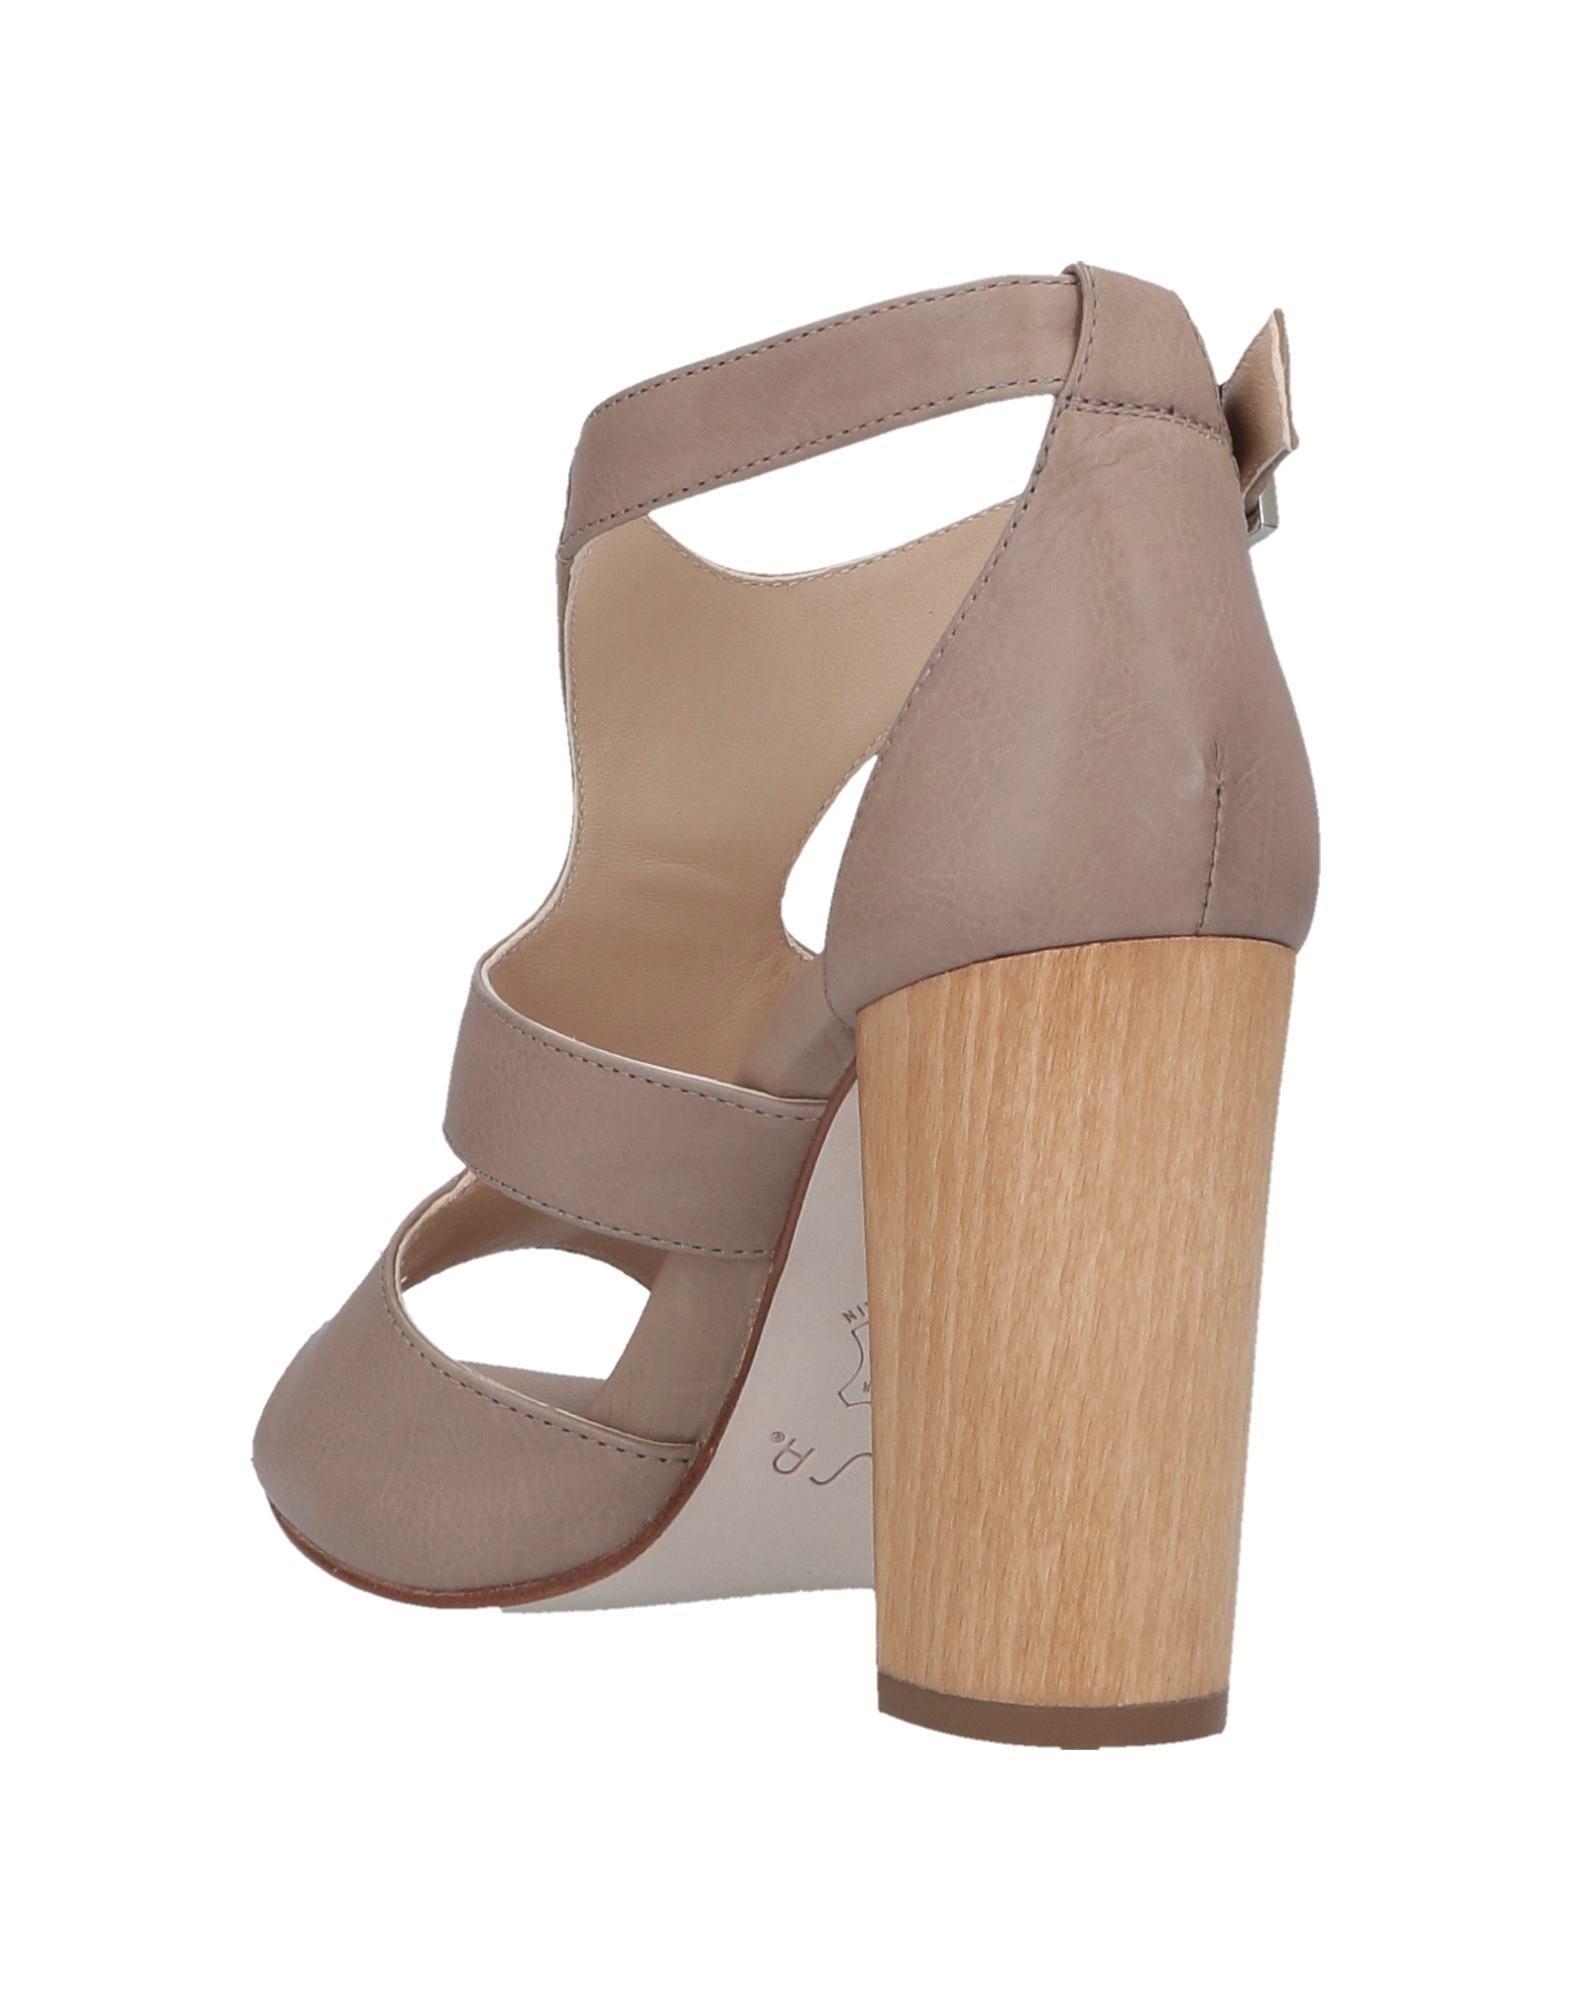 0fbc97432b80 Lyst - Unisa Sandals in Brown